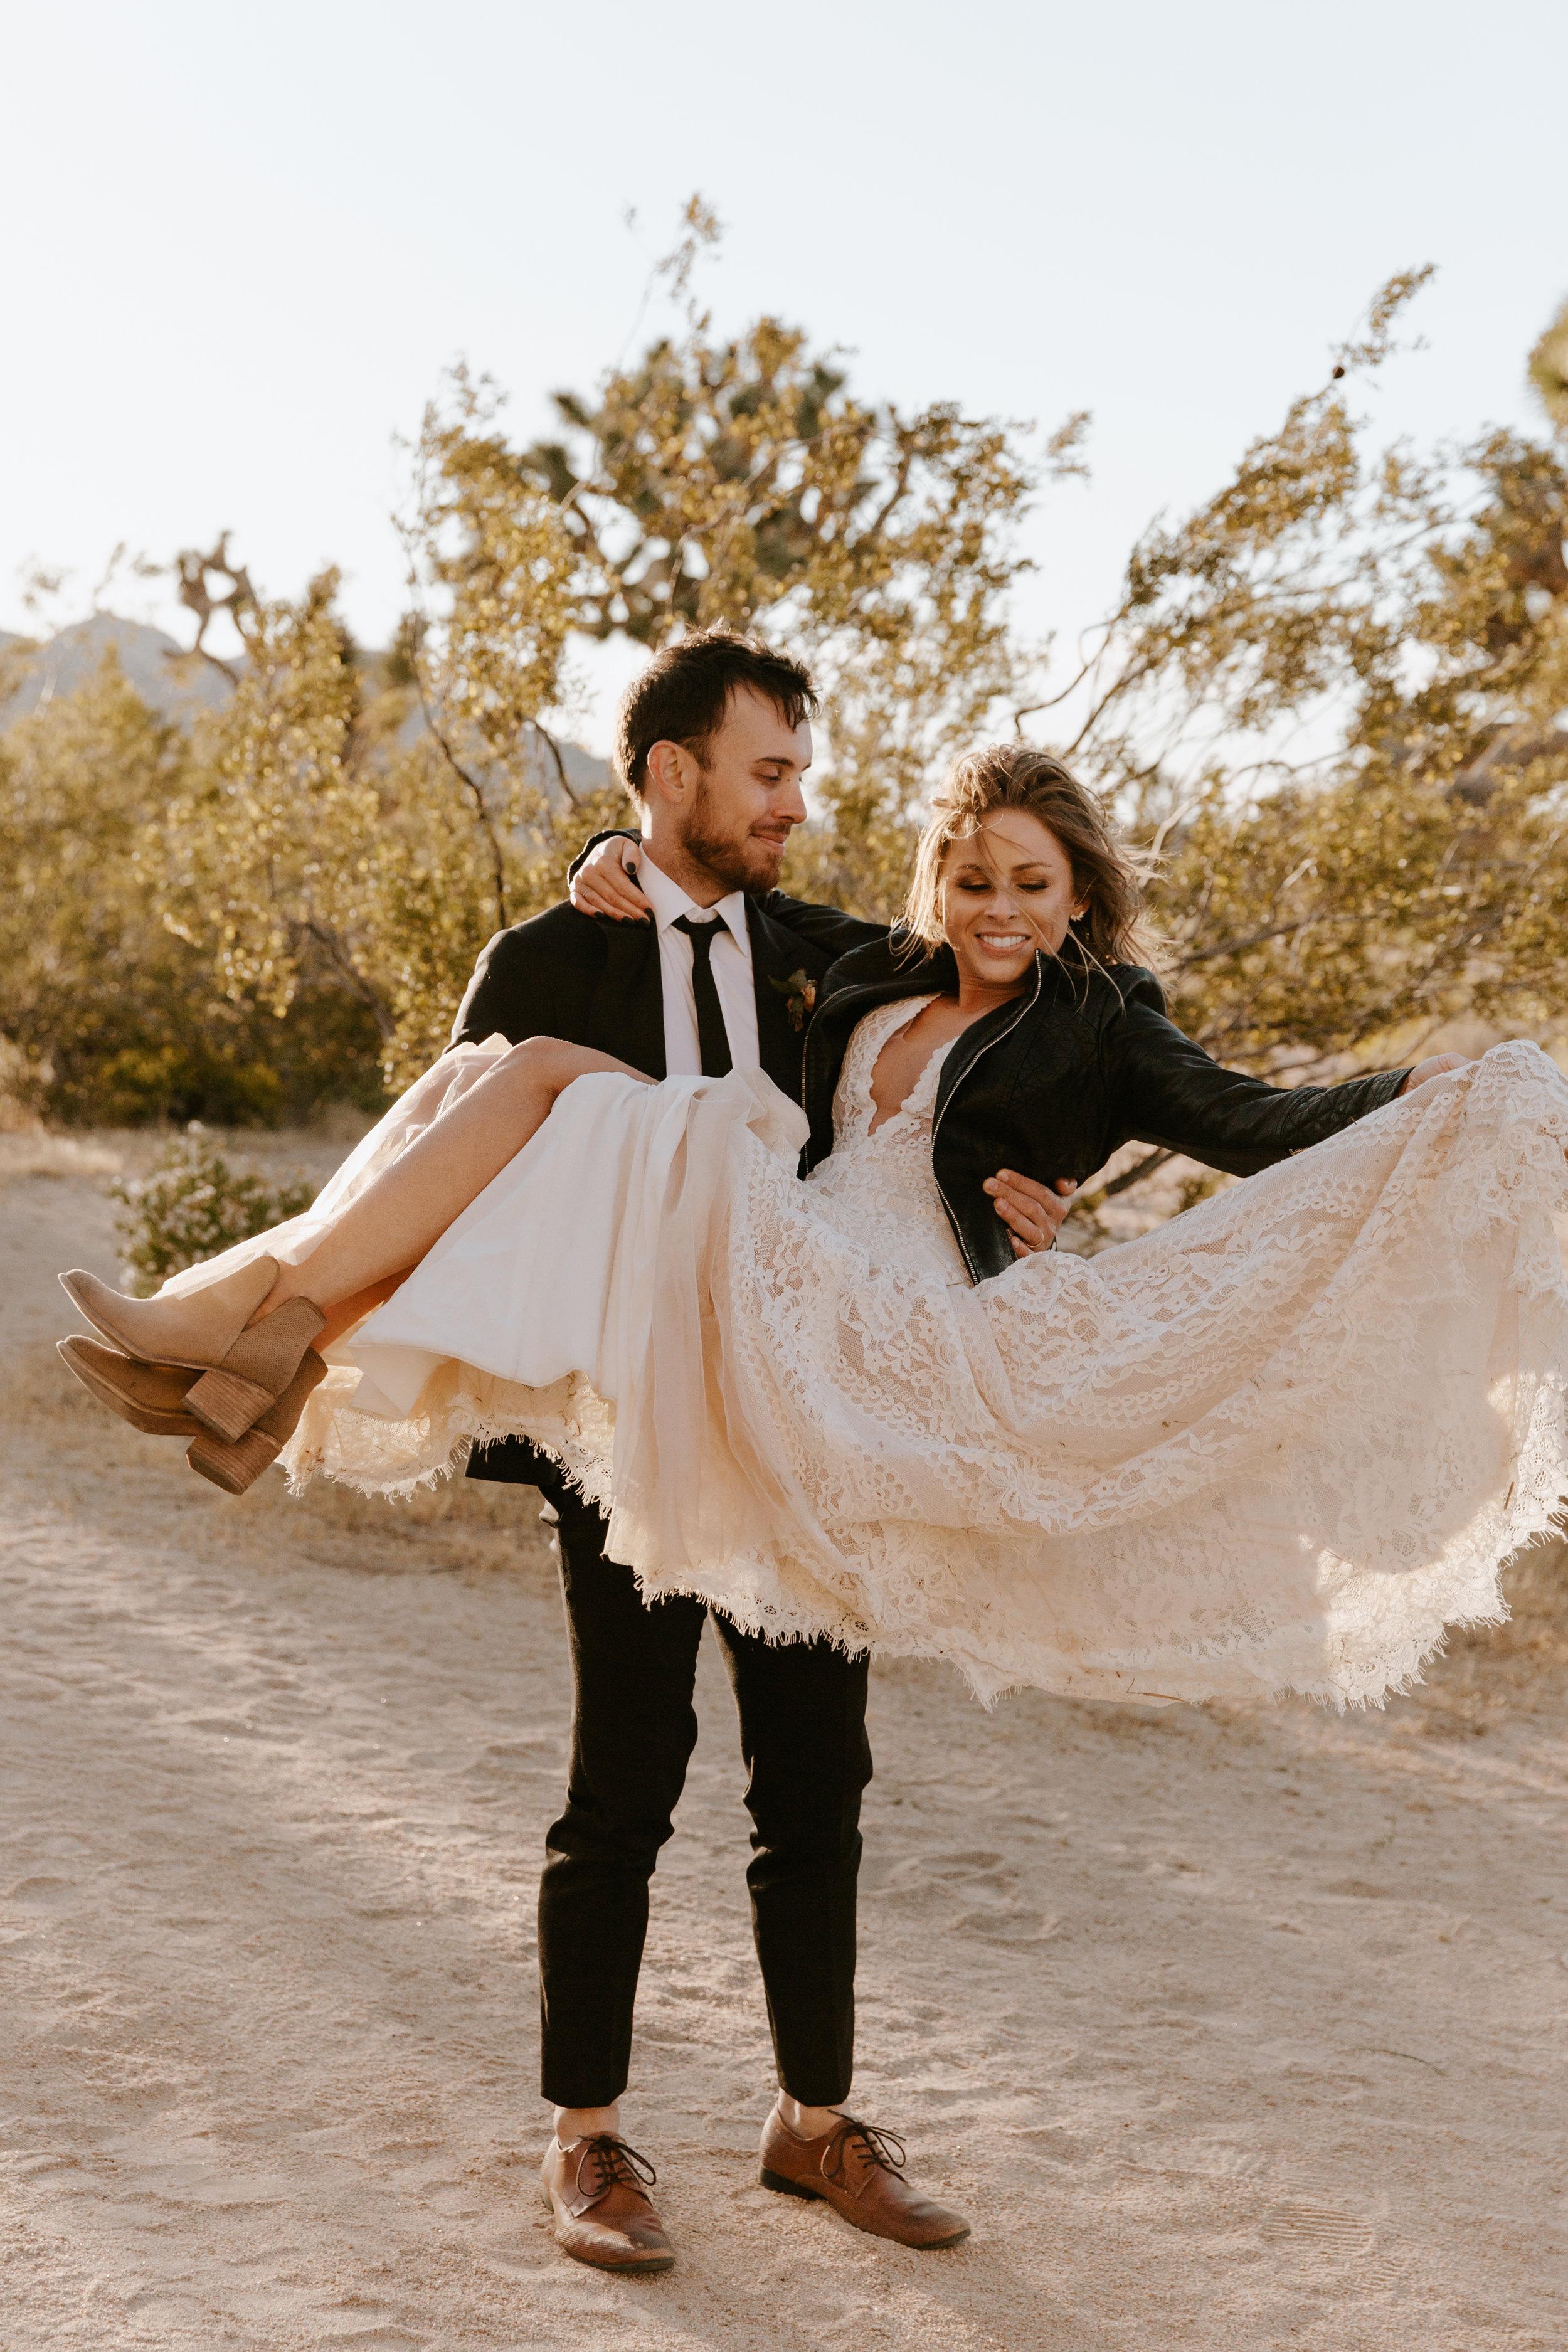 2019-05-26_Callie-Evan_Wedding_Joshua Tree_Paige Nelson_PREVIEWS HR-56.jpg